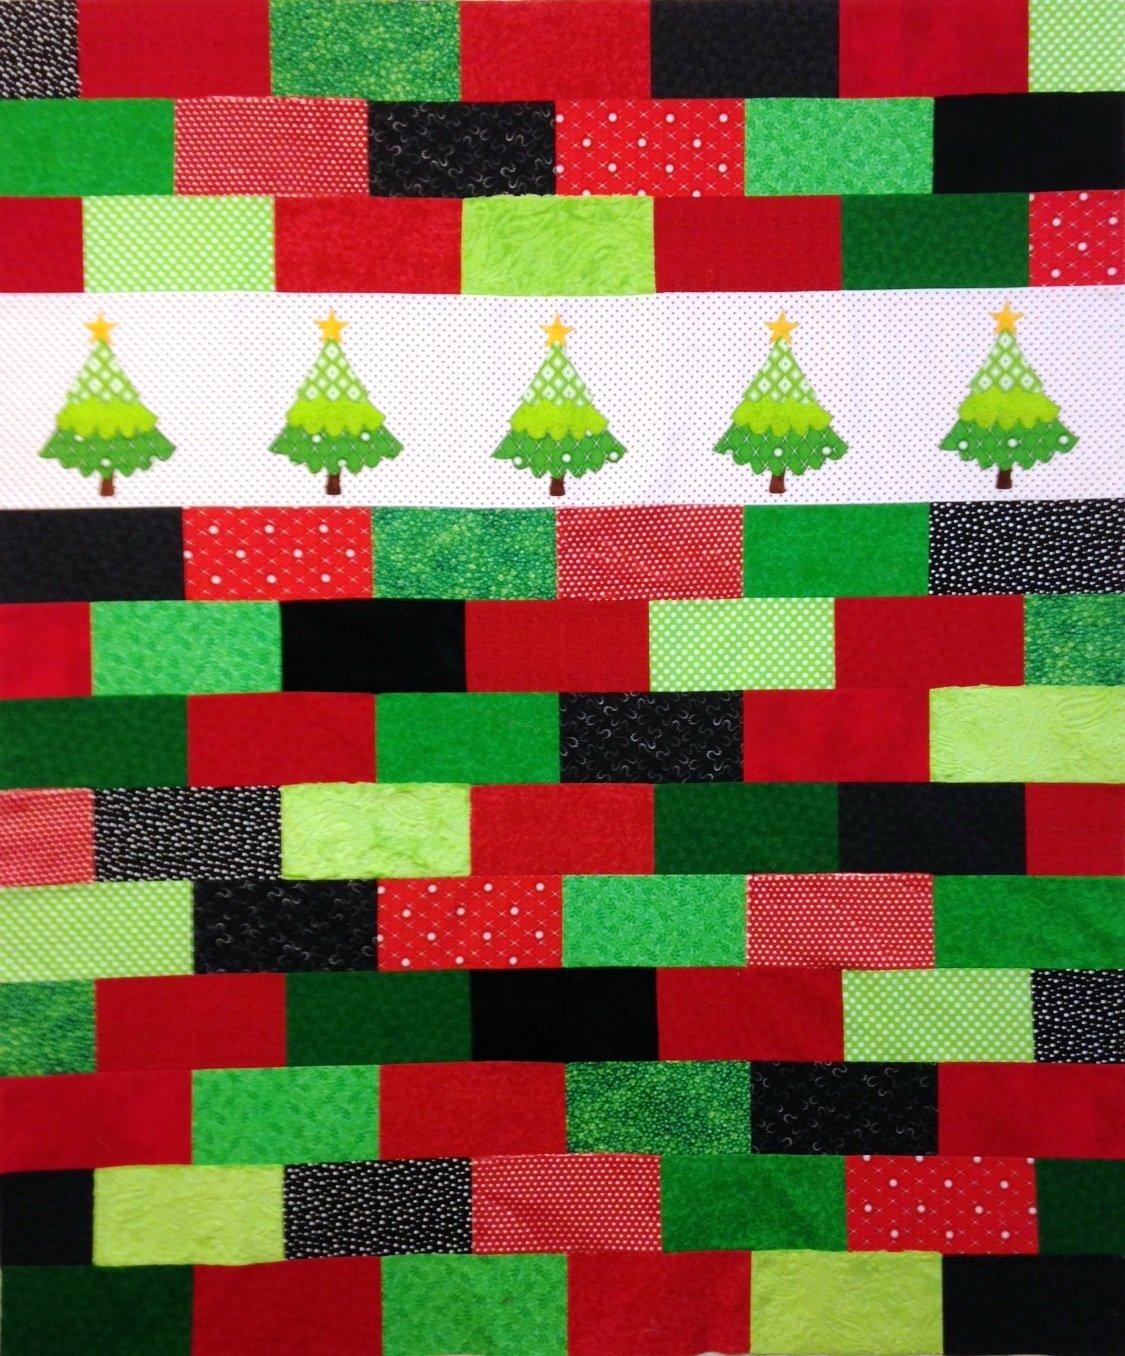 Cozy Trees Pattern & Laser Cut Appliques